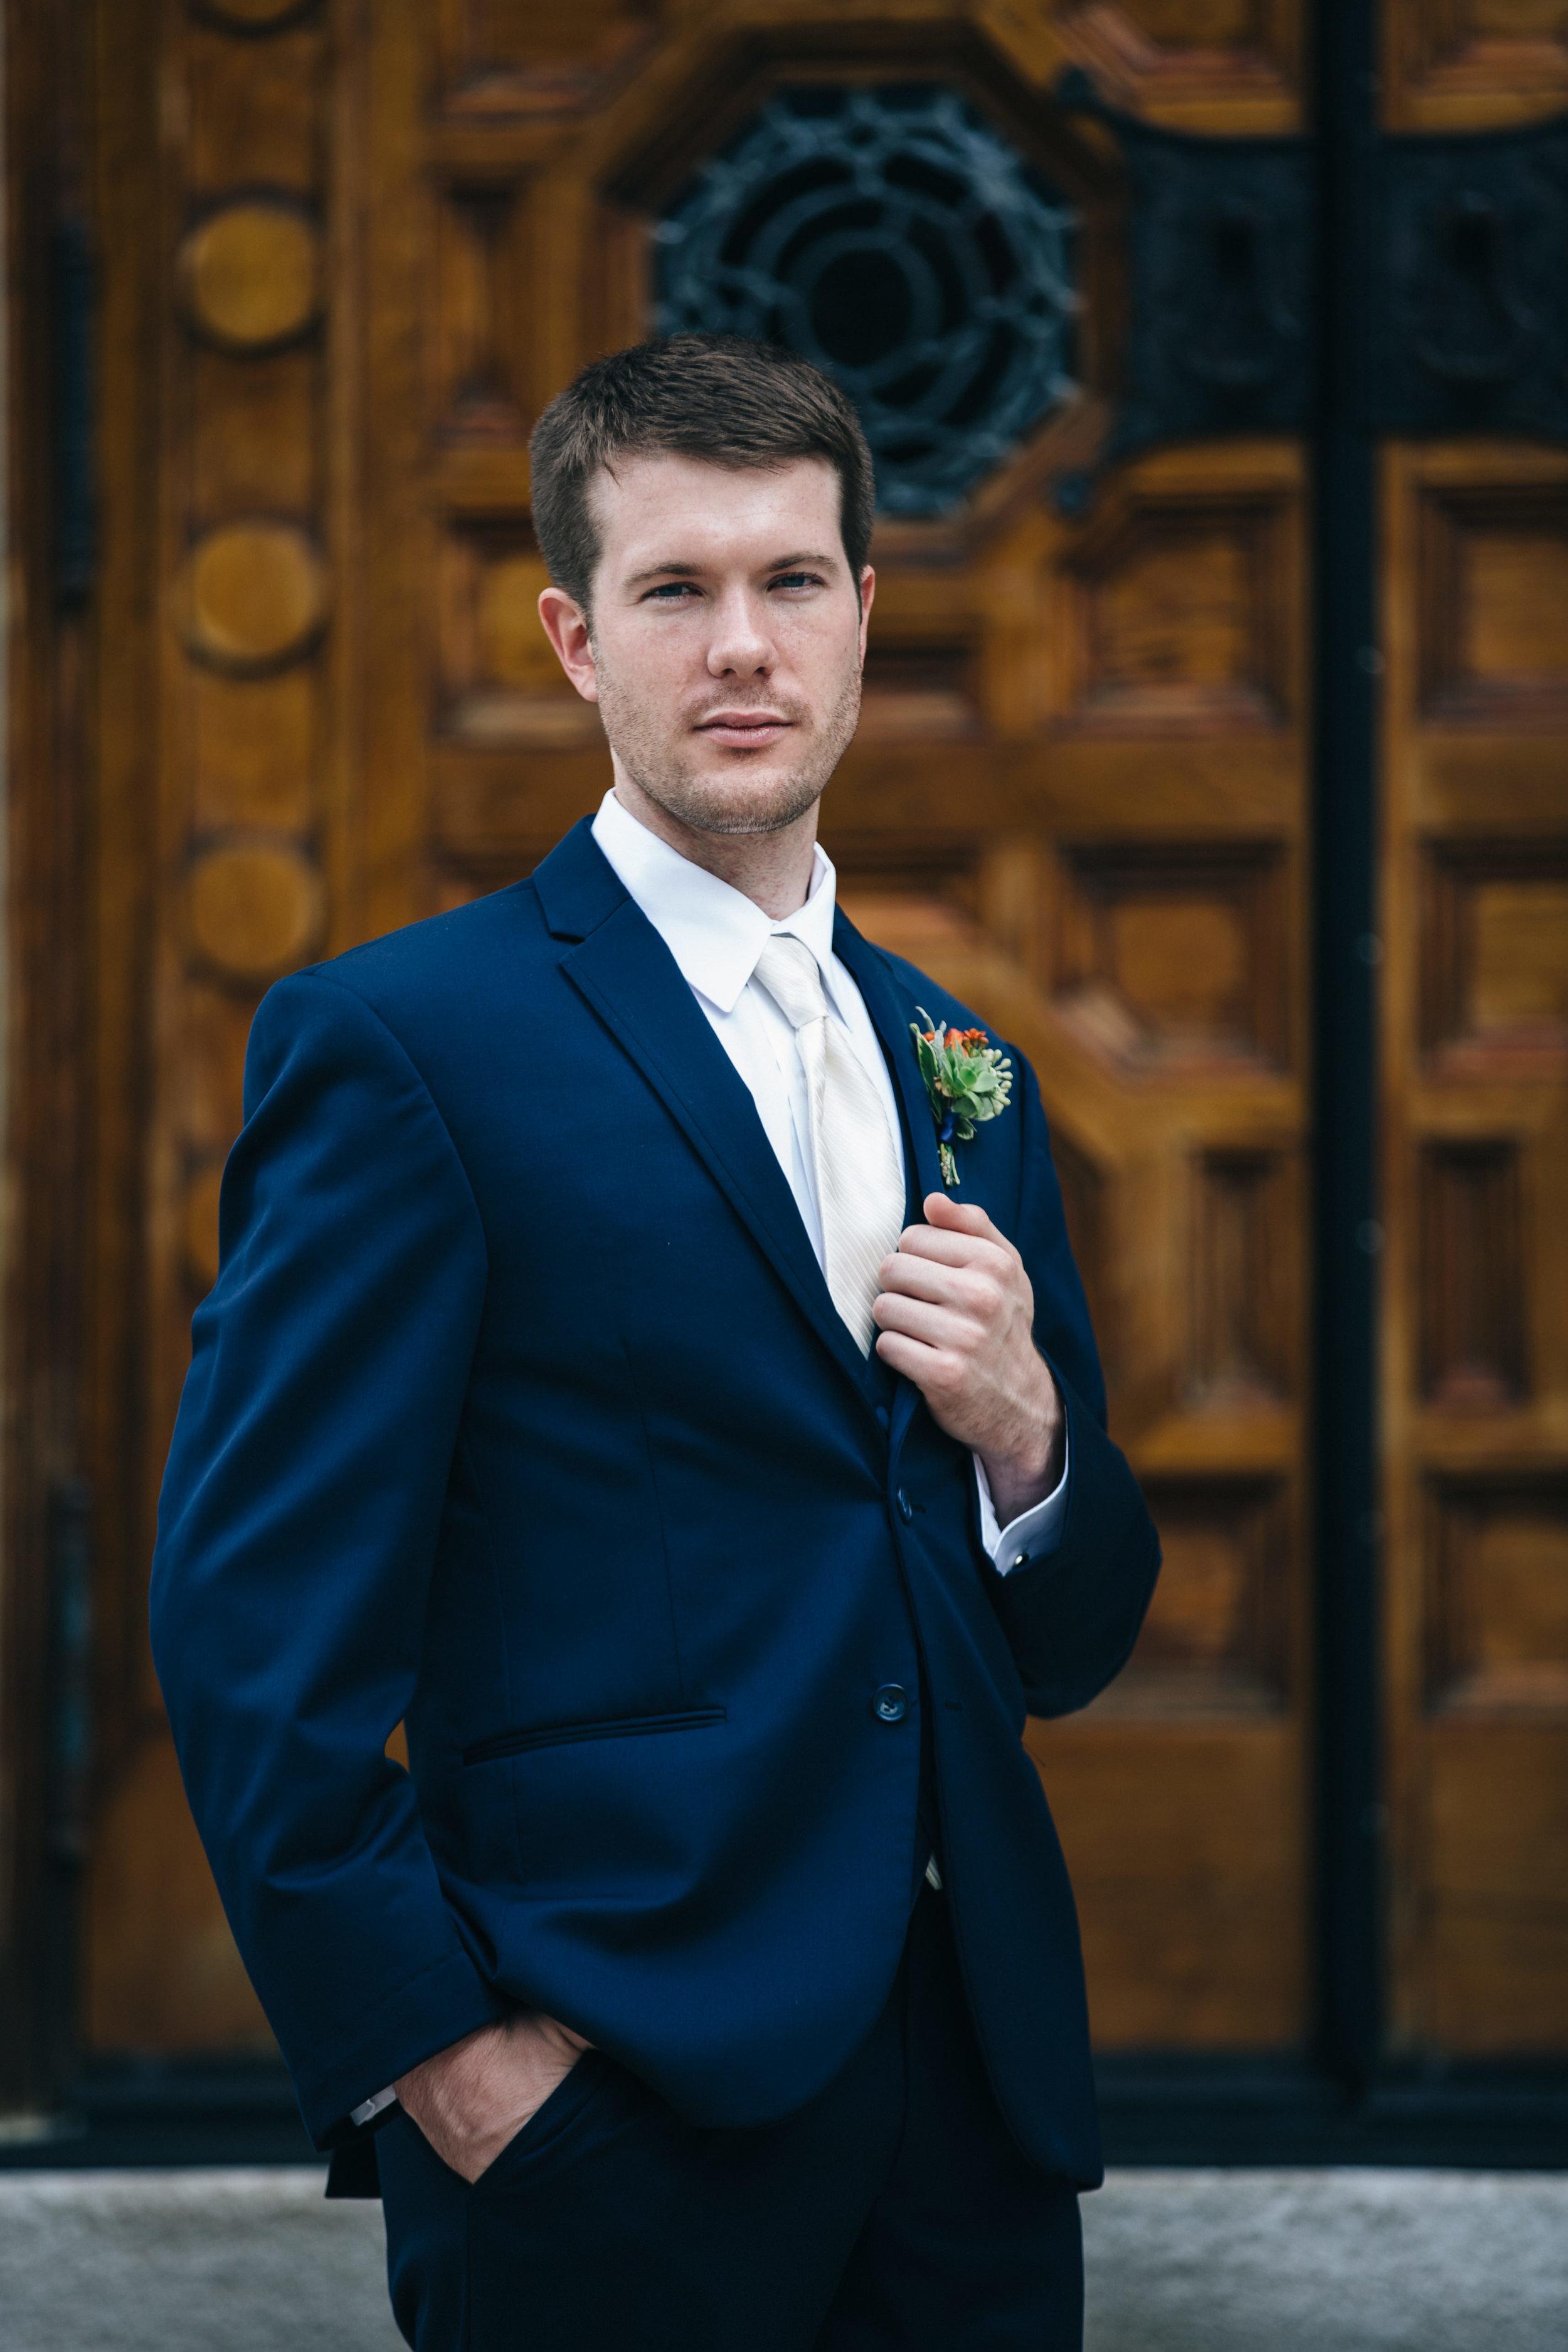 Wedding photography of groom in navy blue suit.